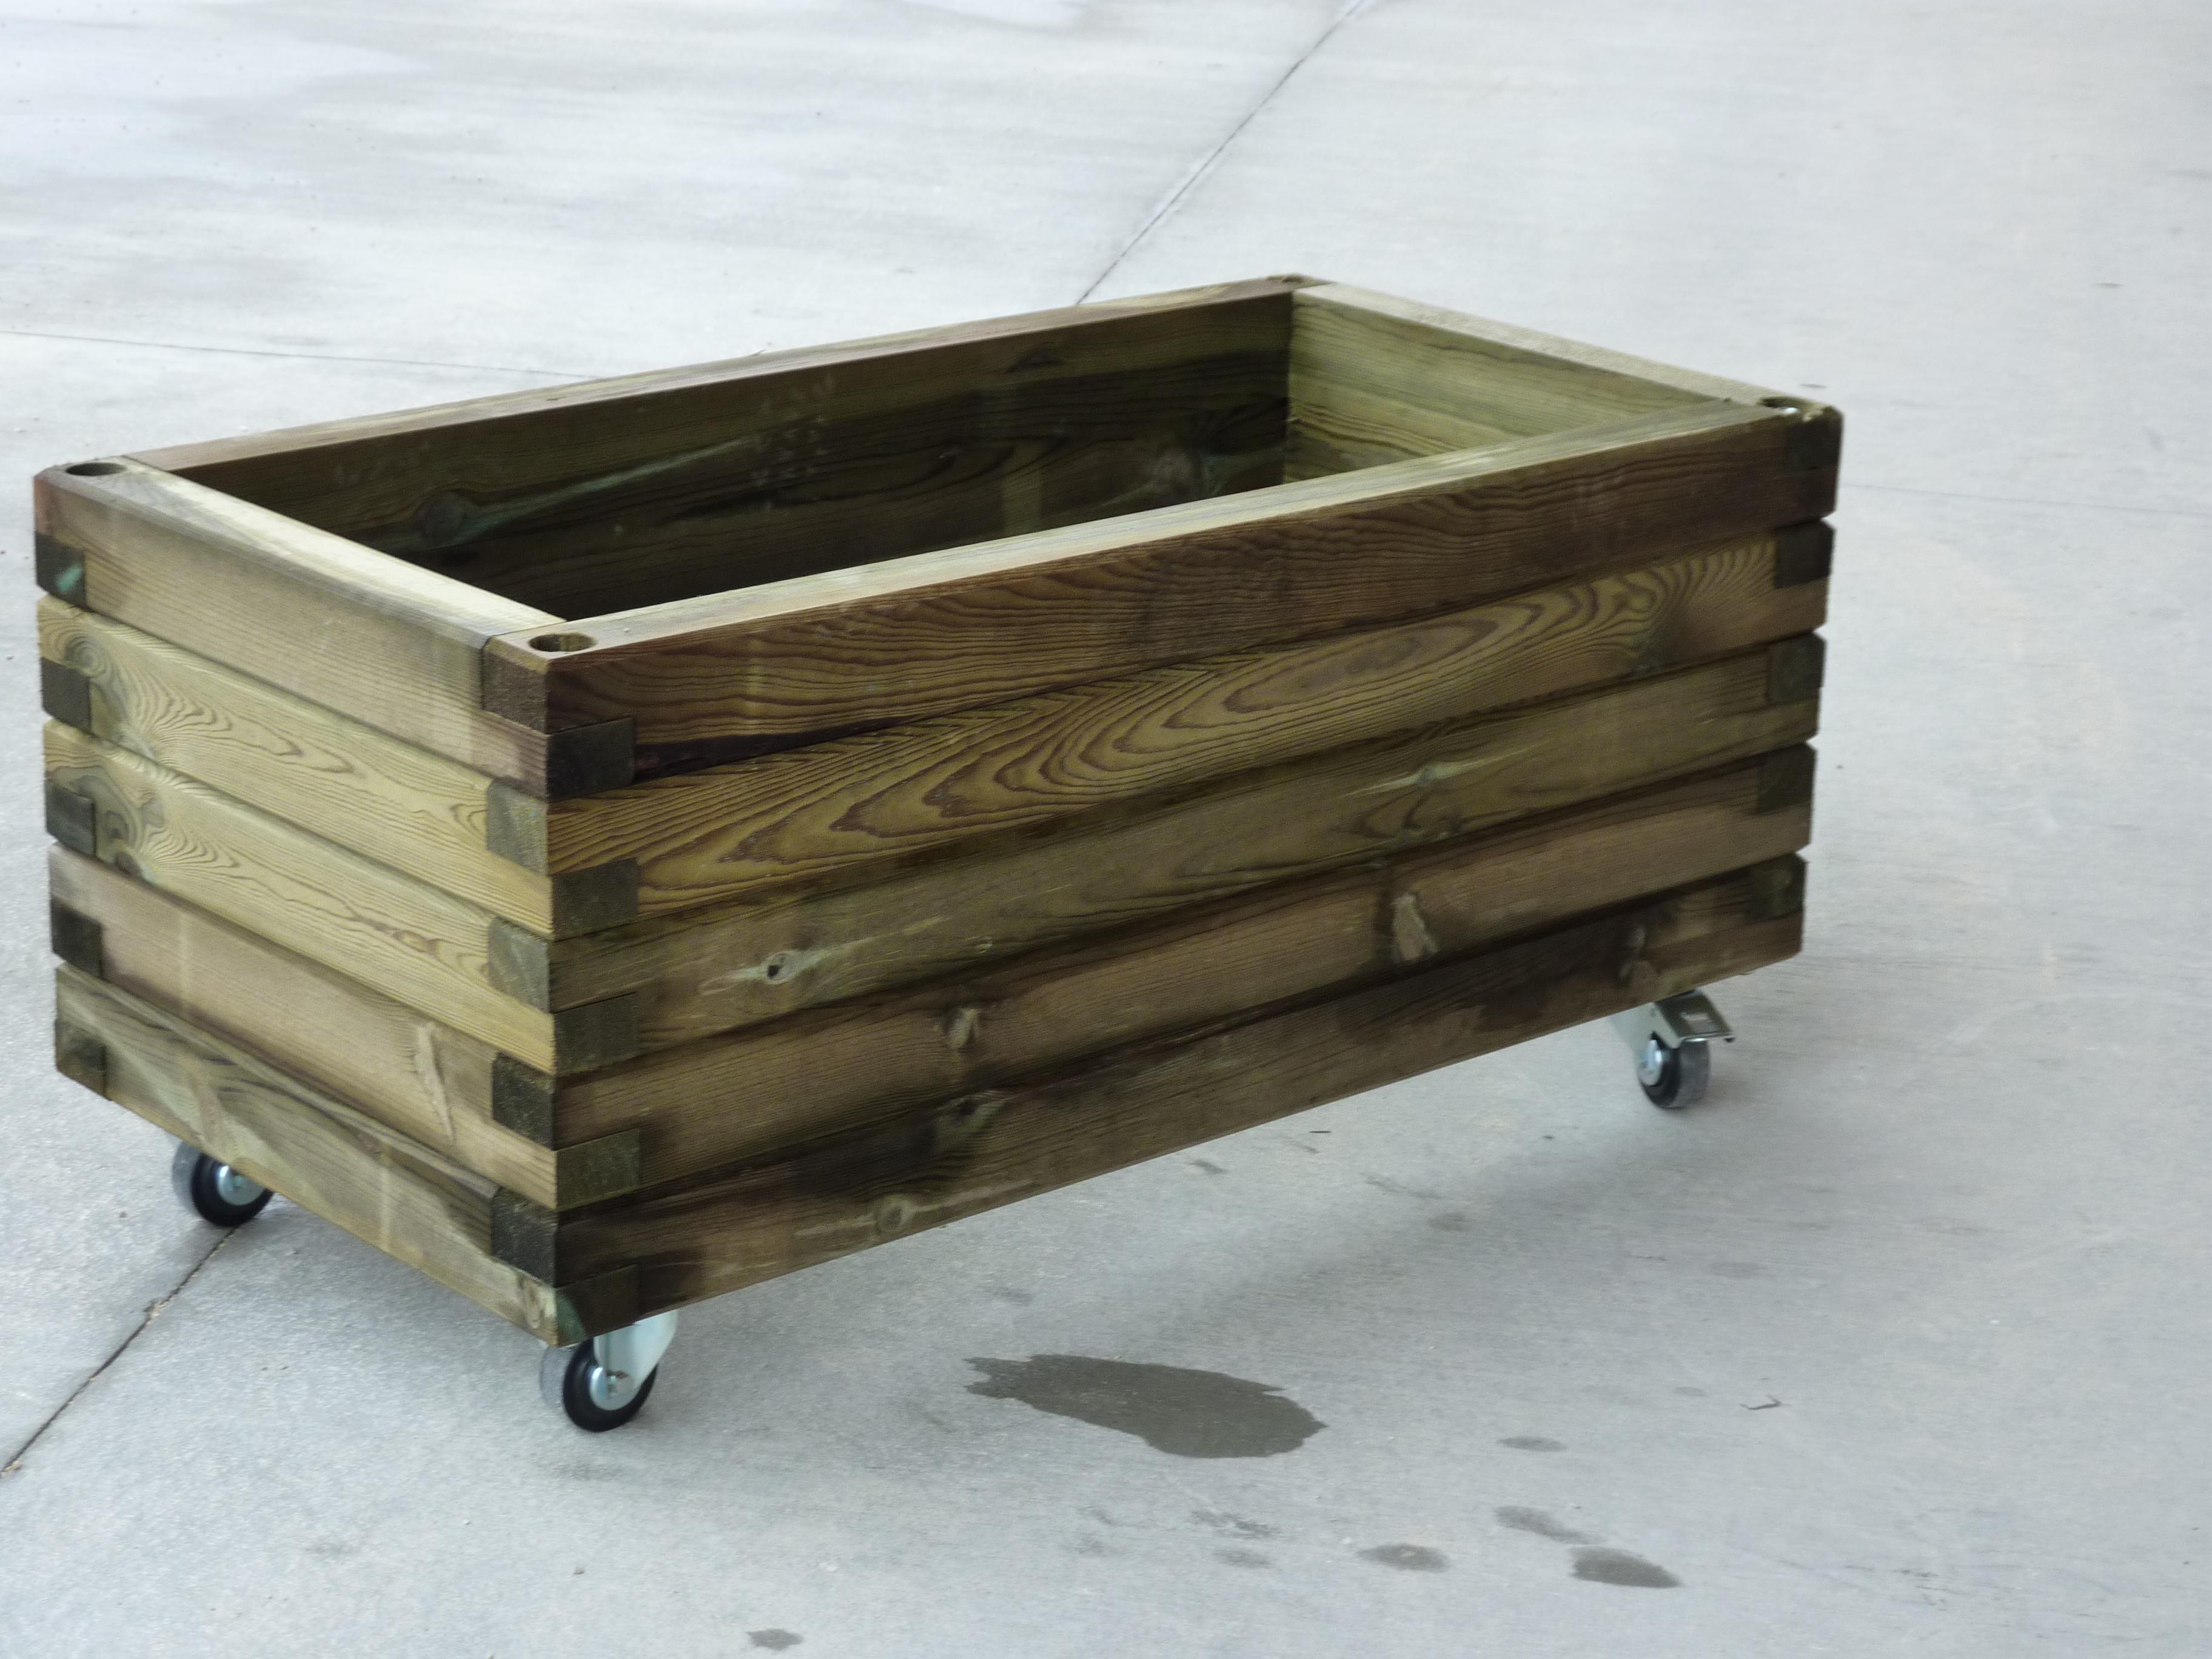 jardini re mibois autoclave 120x60x53 menuiserie bertin. Black Bedroom Furniture Sets. Home Design Ideas